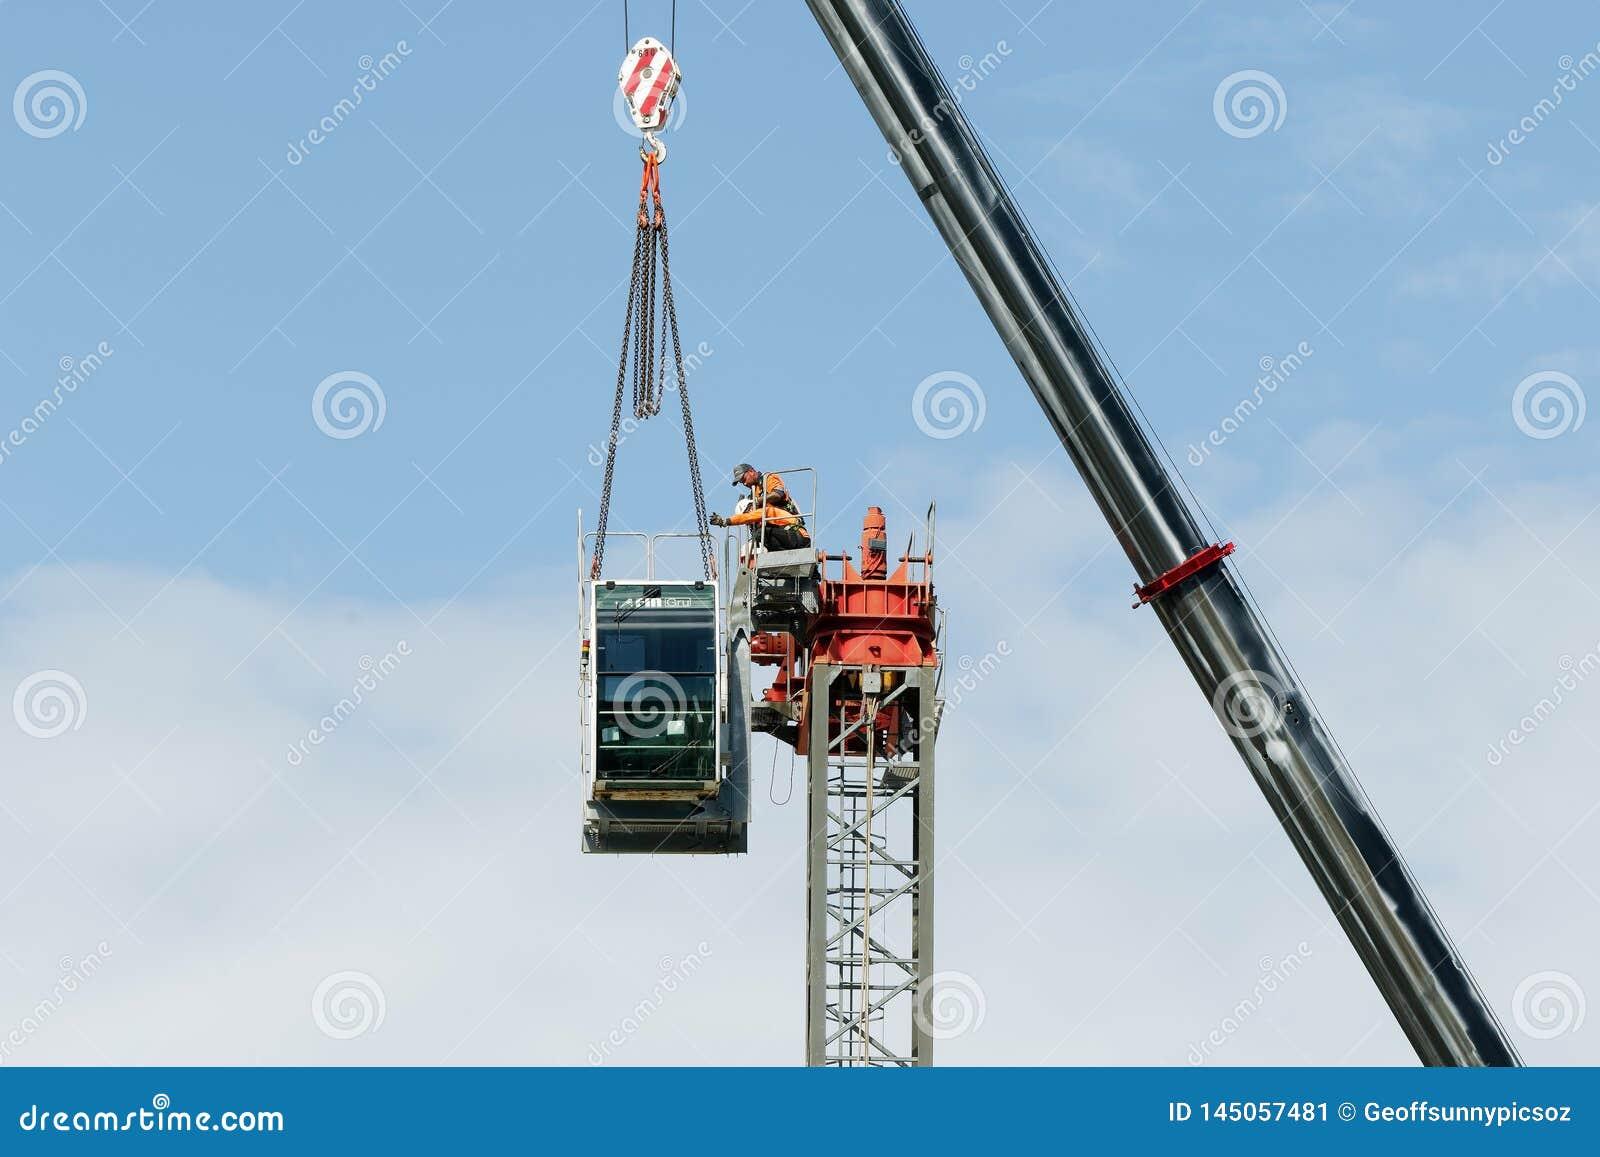 Construction crane removal. Update ed315. Gosford. April 9, 2019